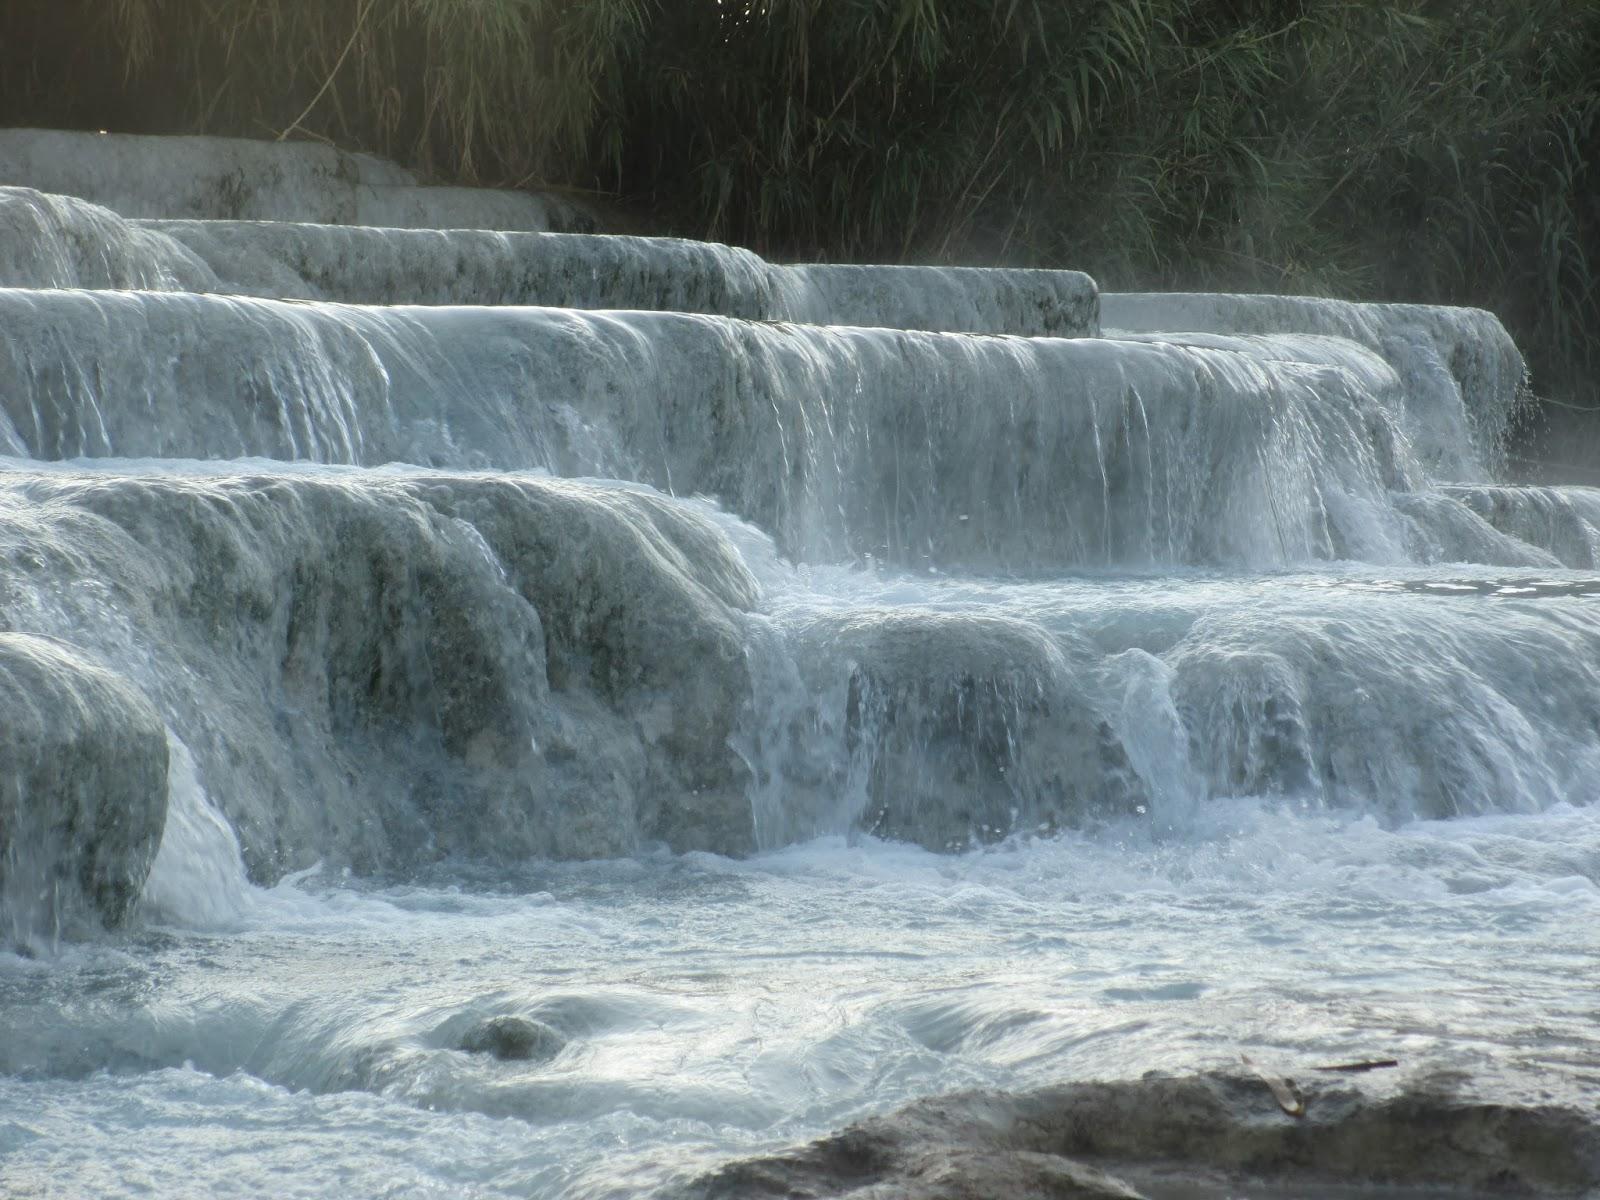 Cascate del Mulino - Hot Springs